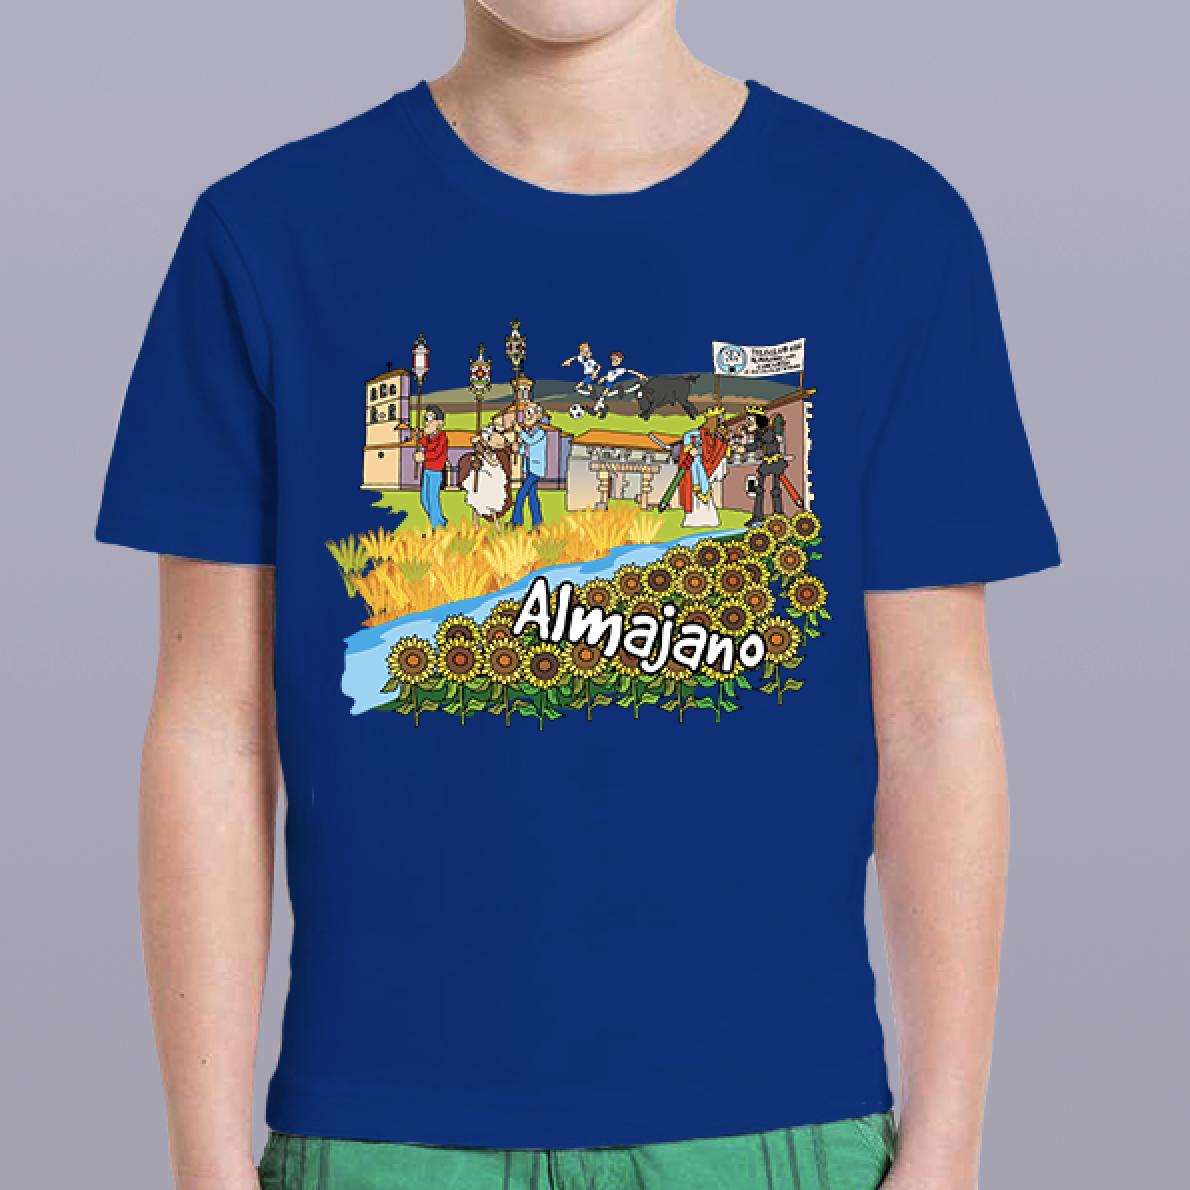 Almajano